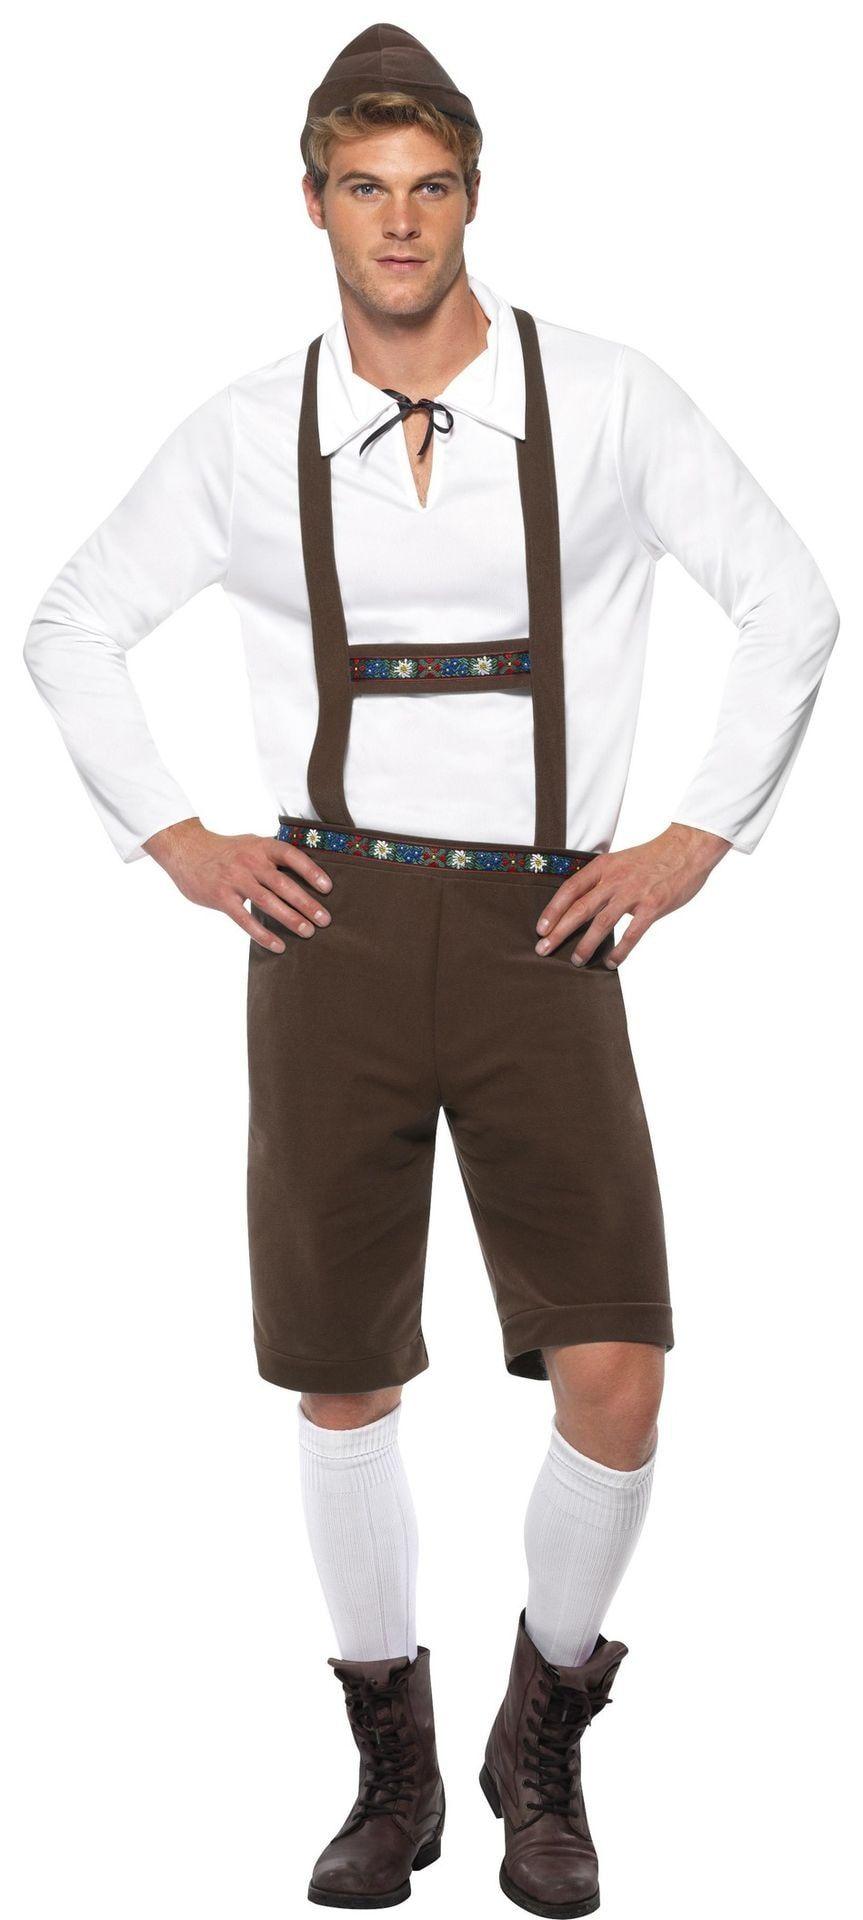 Bierfeest outfit man